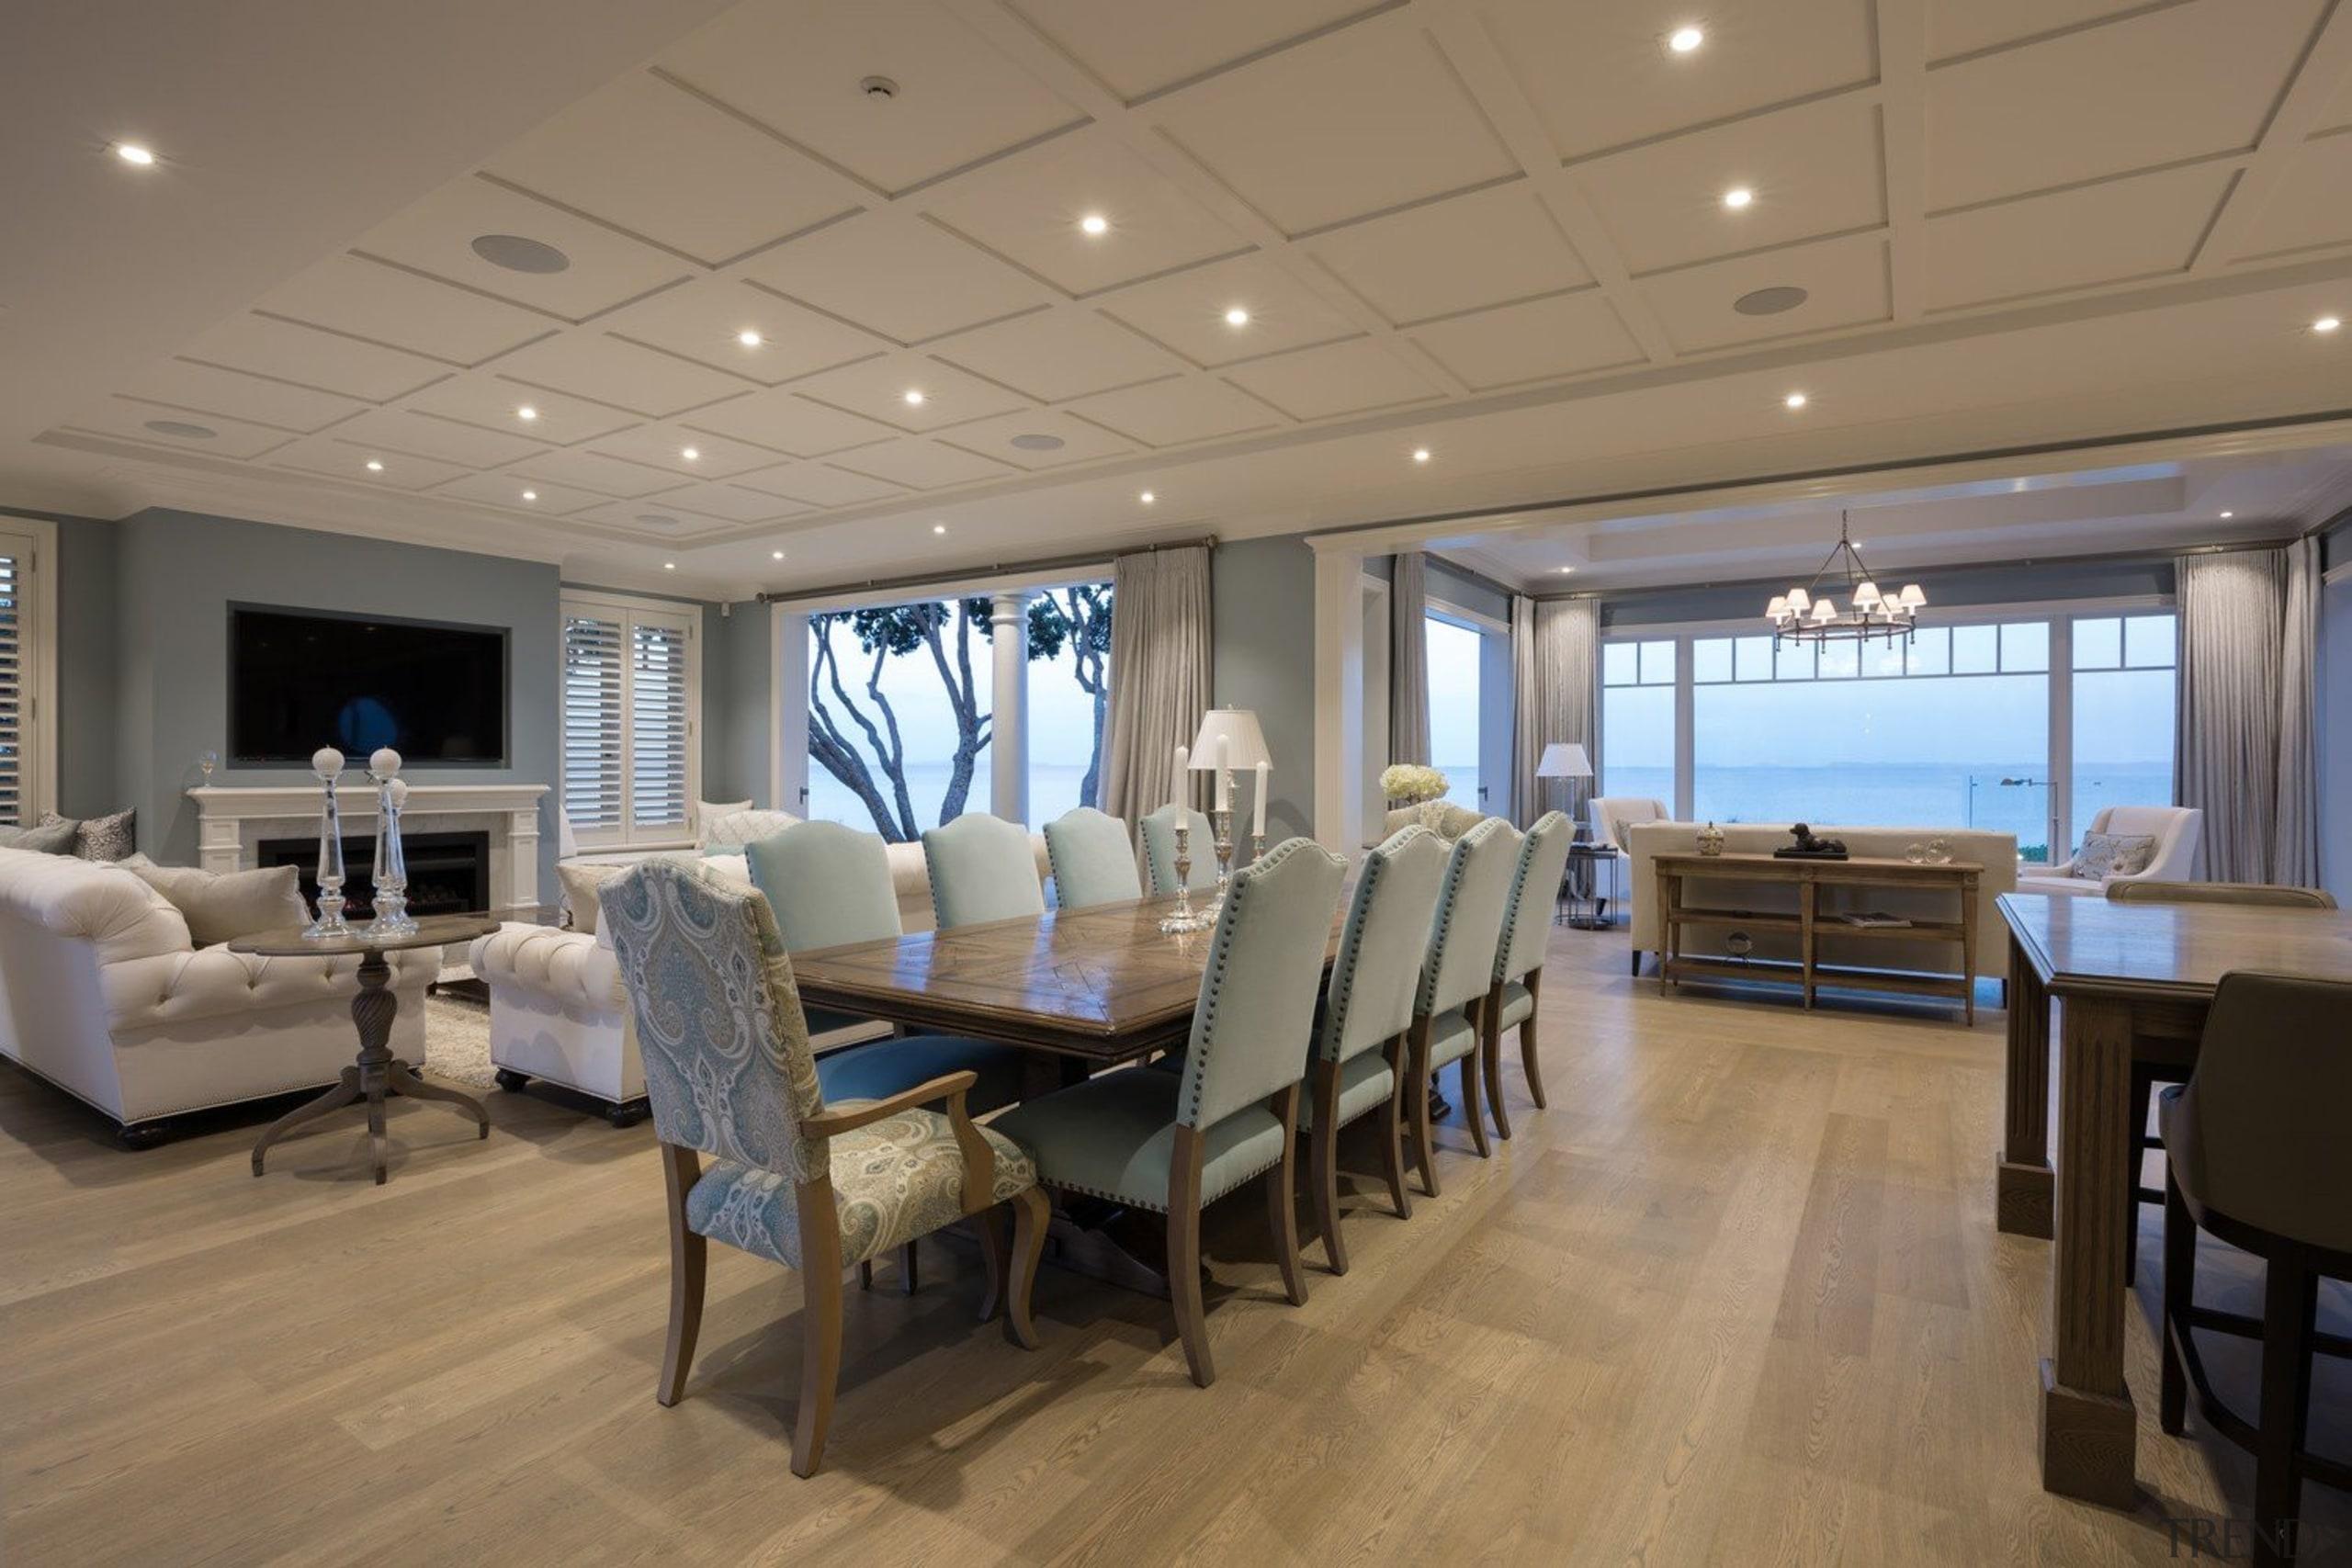 Living area - Living area - ceiling | ceiling, deck, interior design, real estate, brown, gray